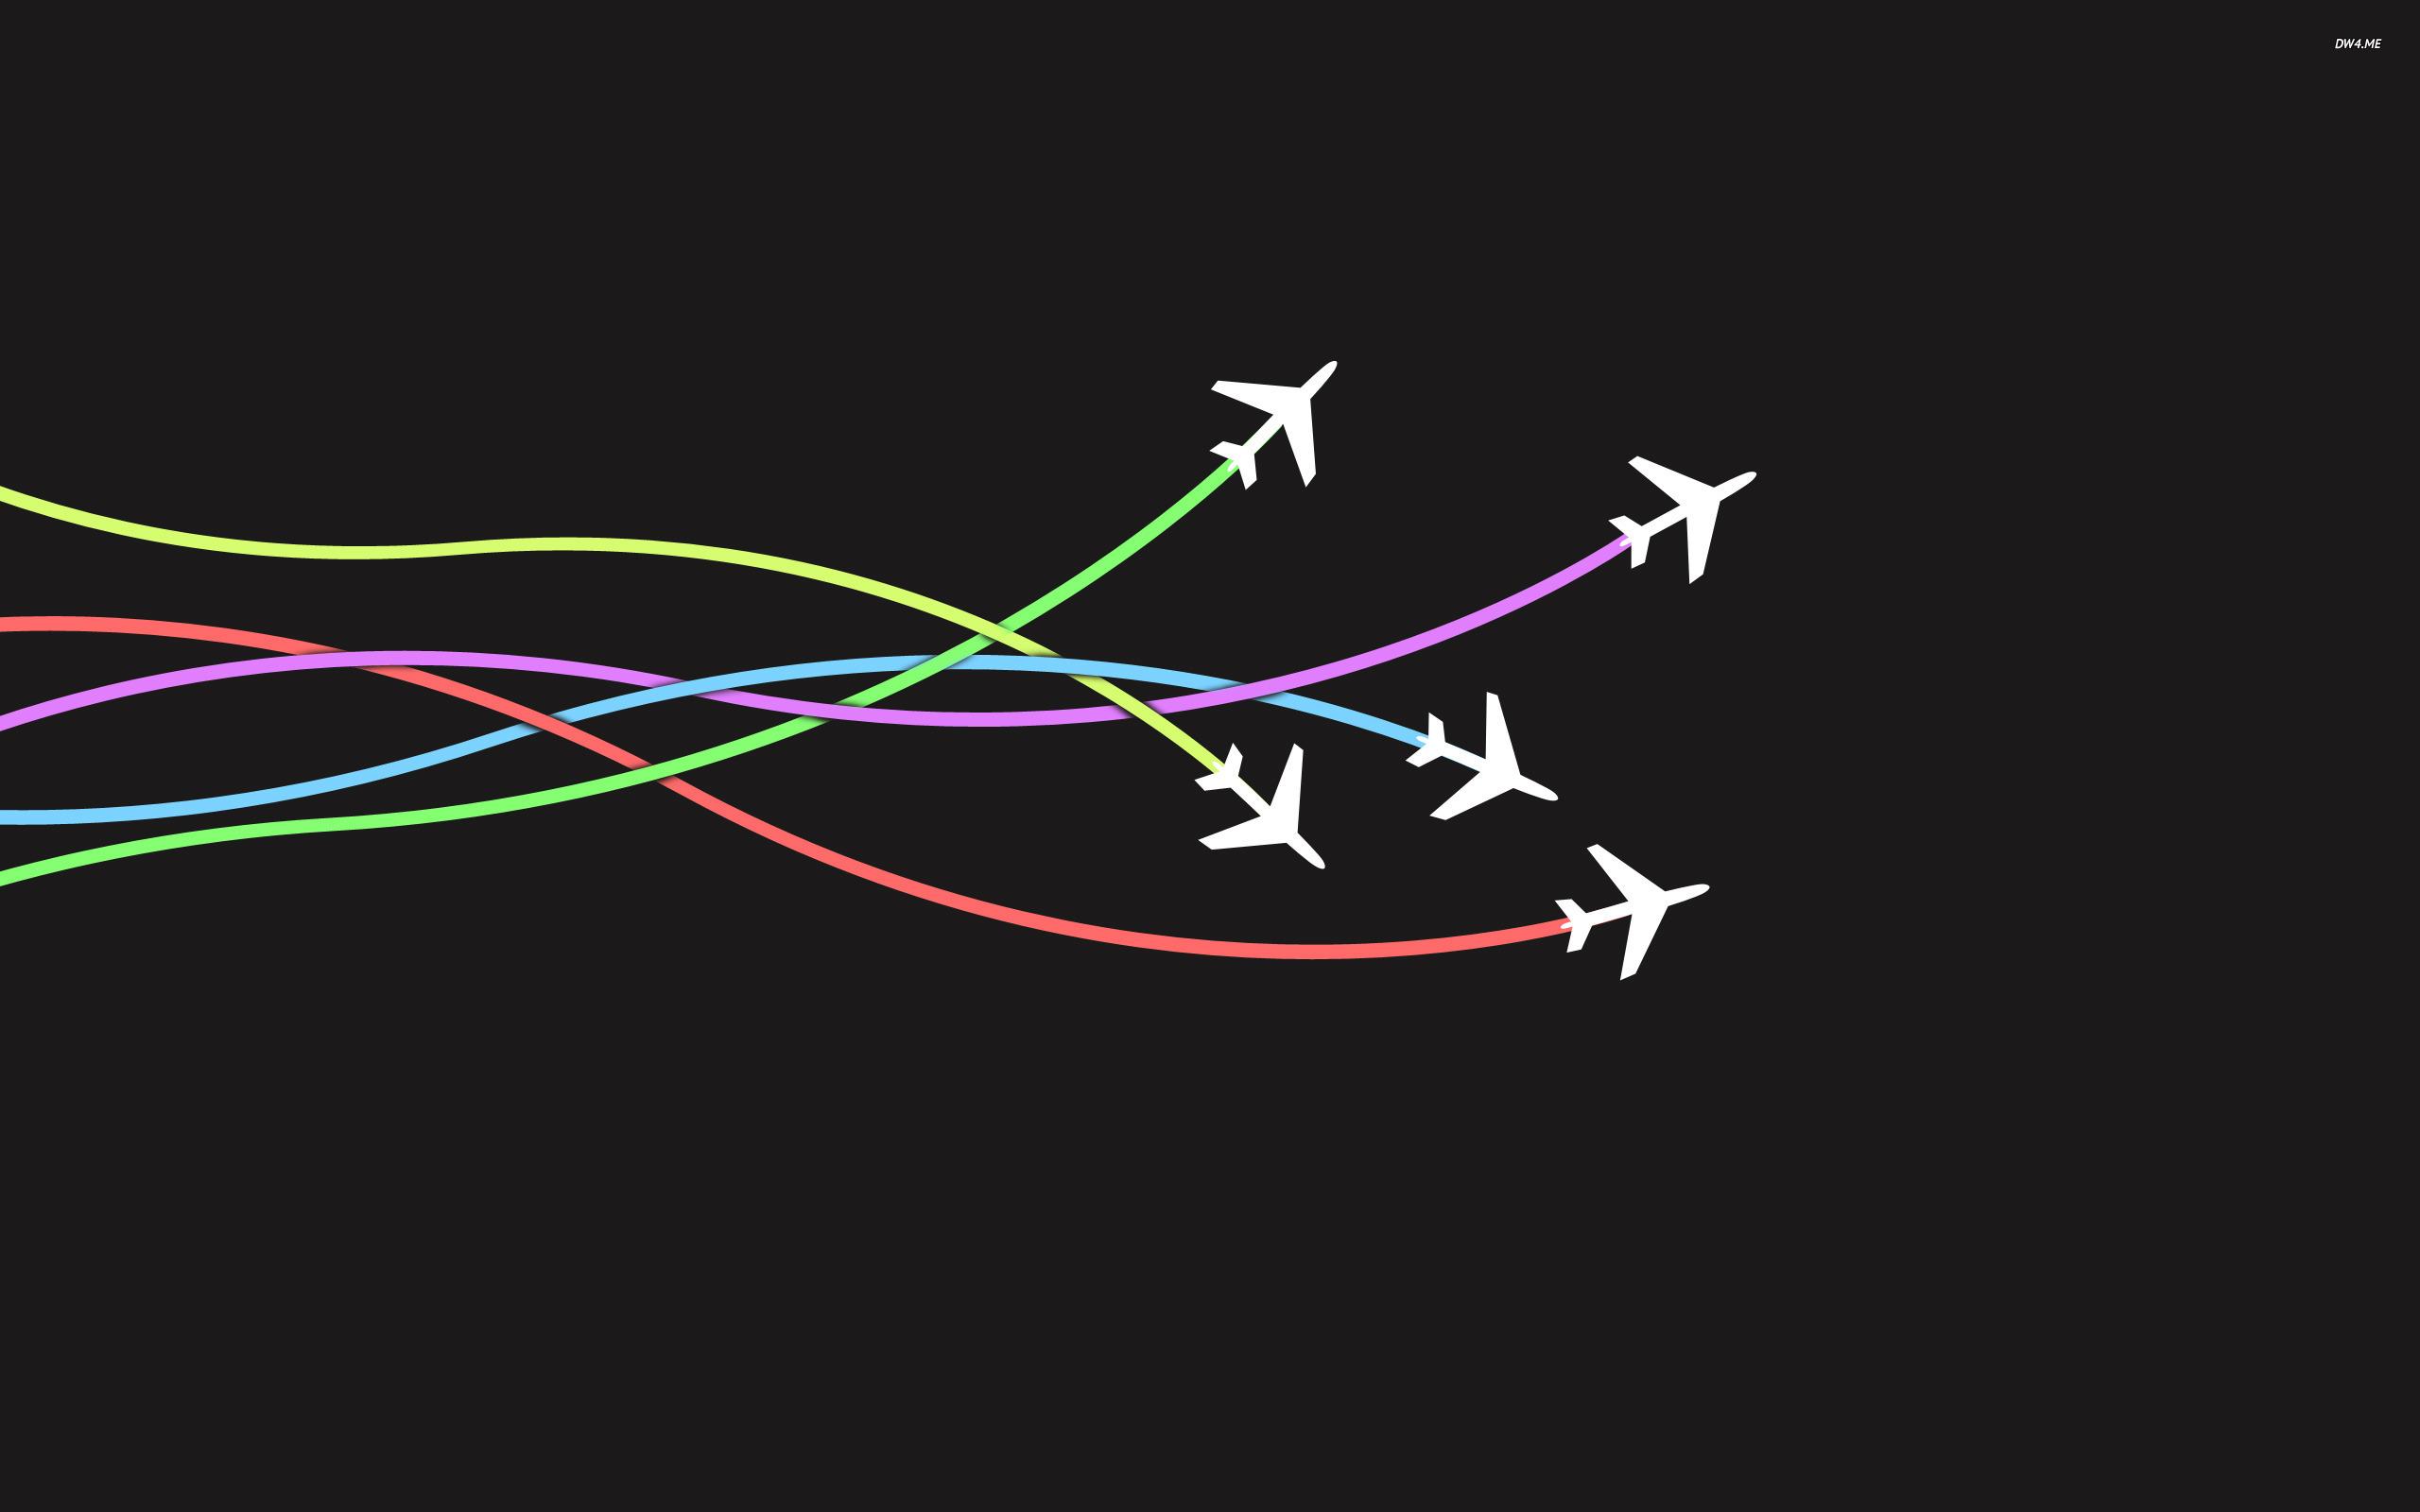 20 more minimalistic airplane plane 1036 Vintage 2560x1600